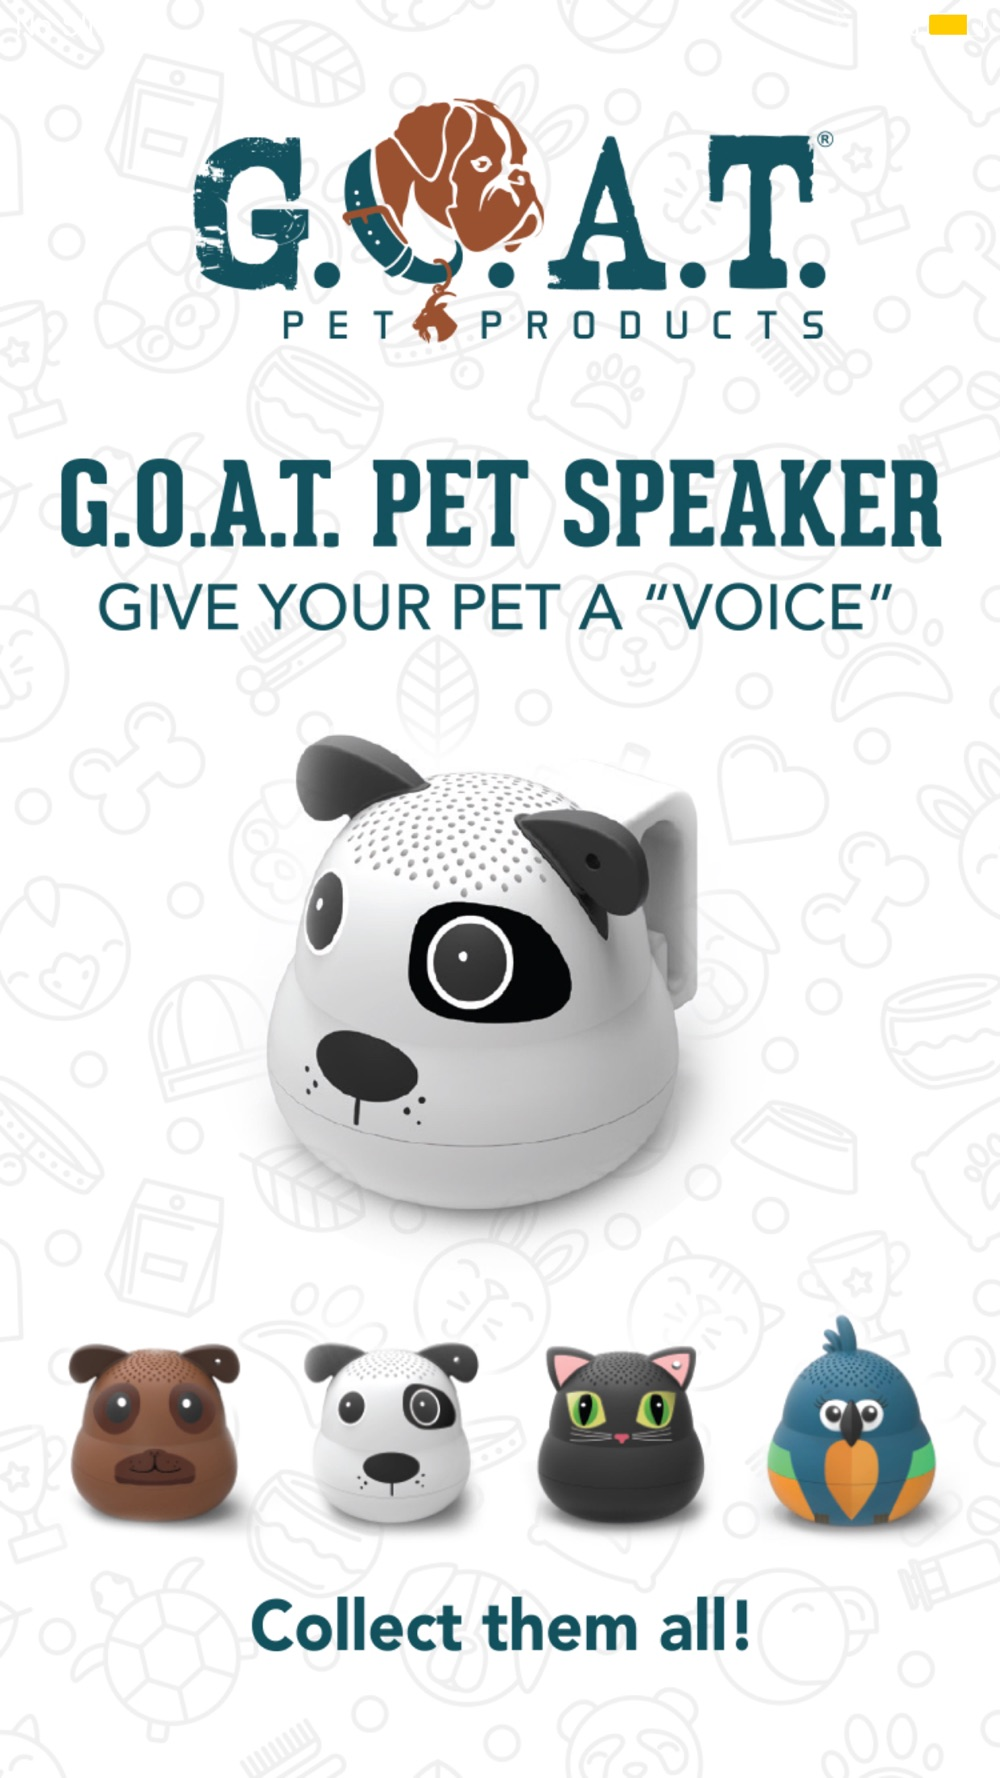 G.O.A.T. Pet Speaker Cheat Codes